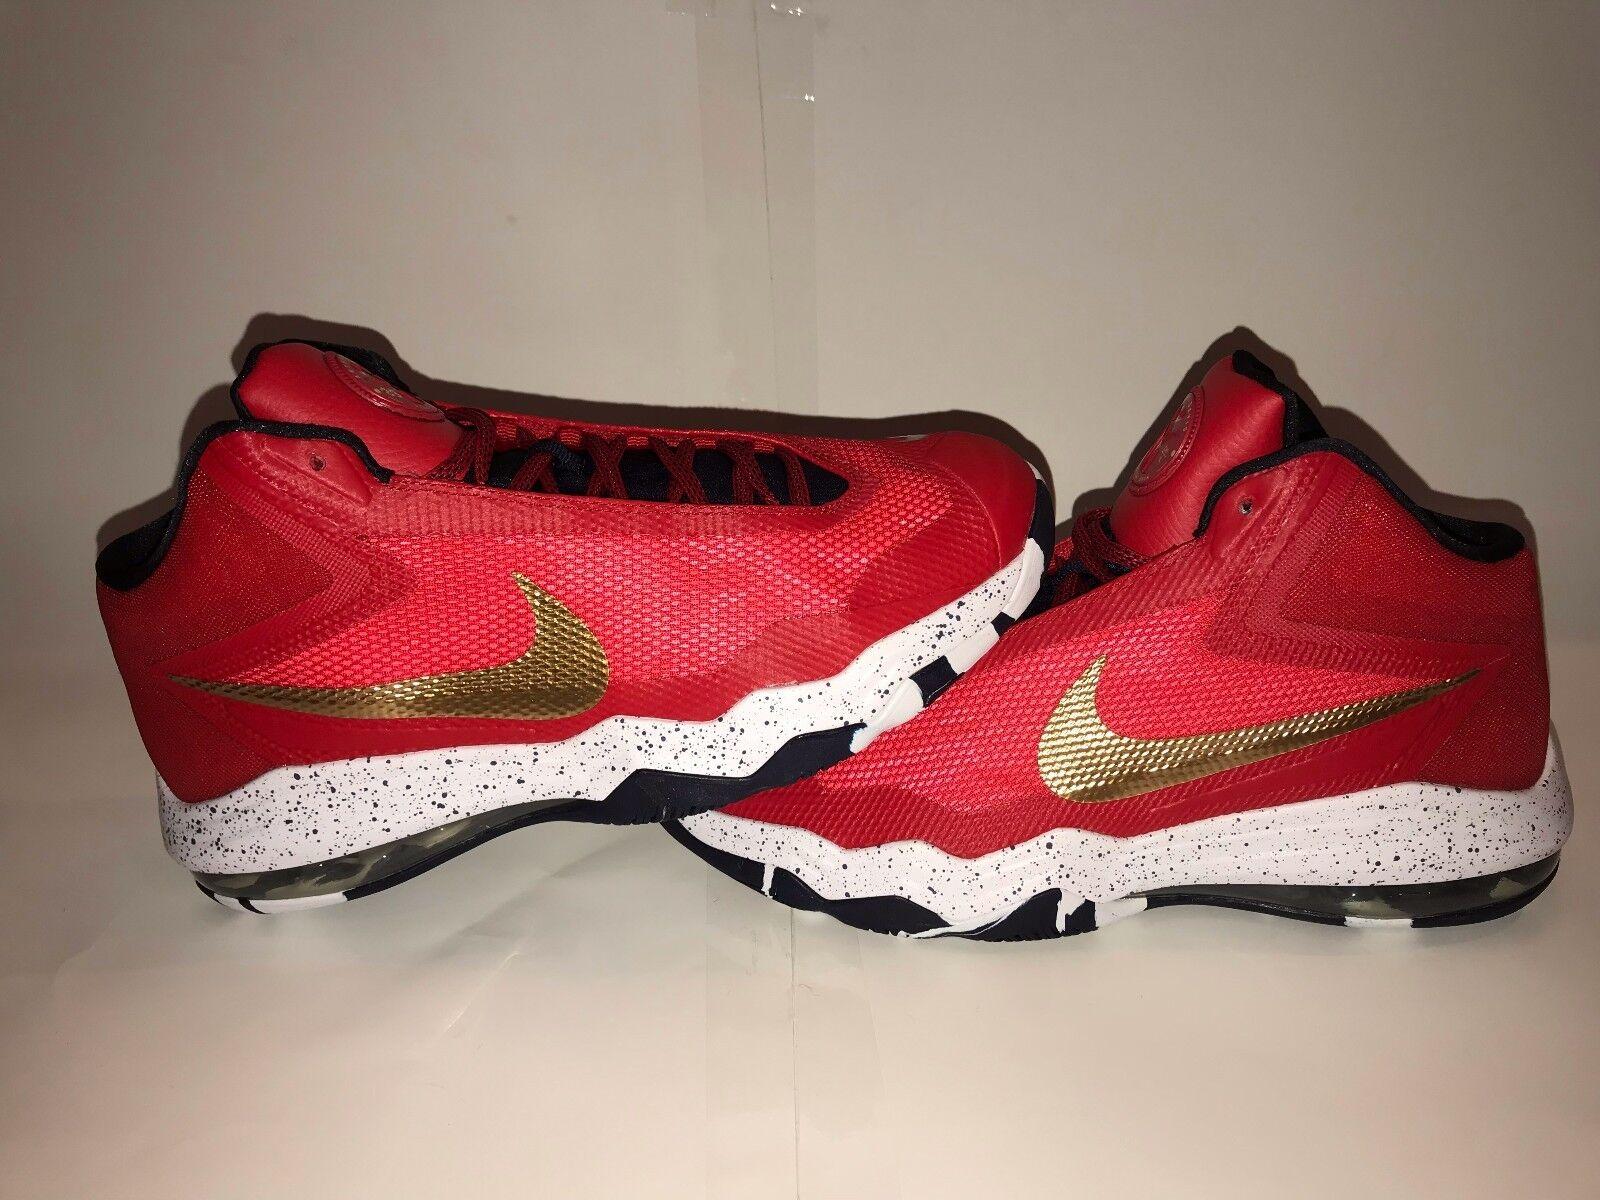 8f6f818617e1 ... Nike Nike Nike Air Max Audacity PE LMTD Anthony Davis Phatman USA Size  11 100% ...